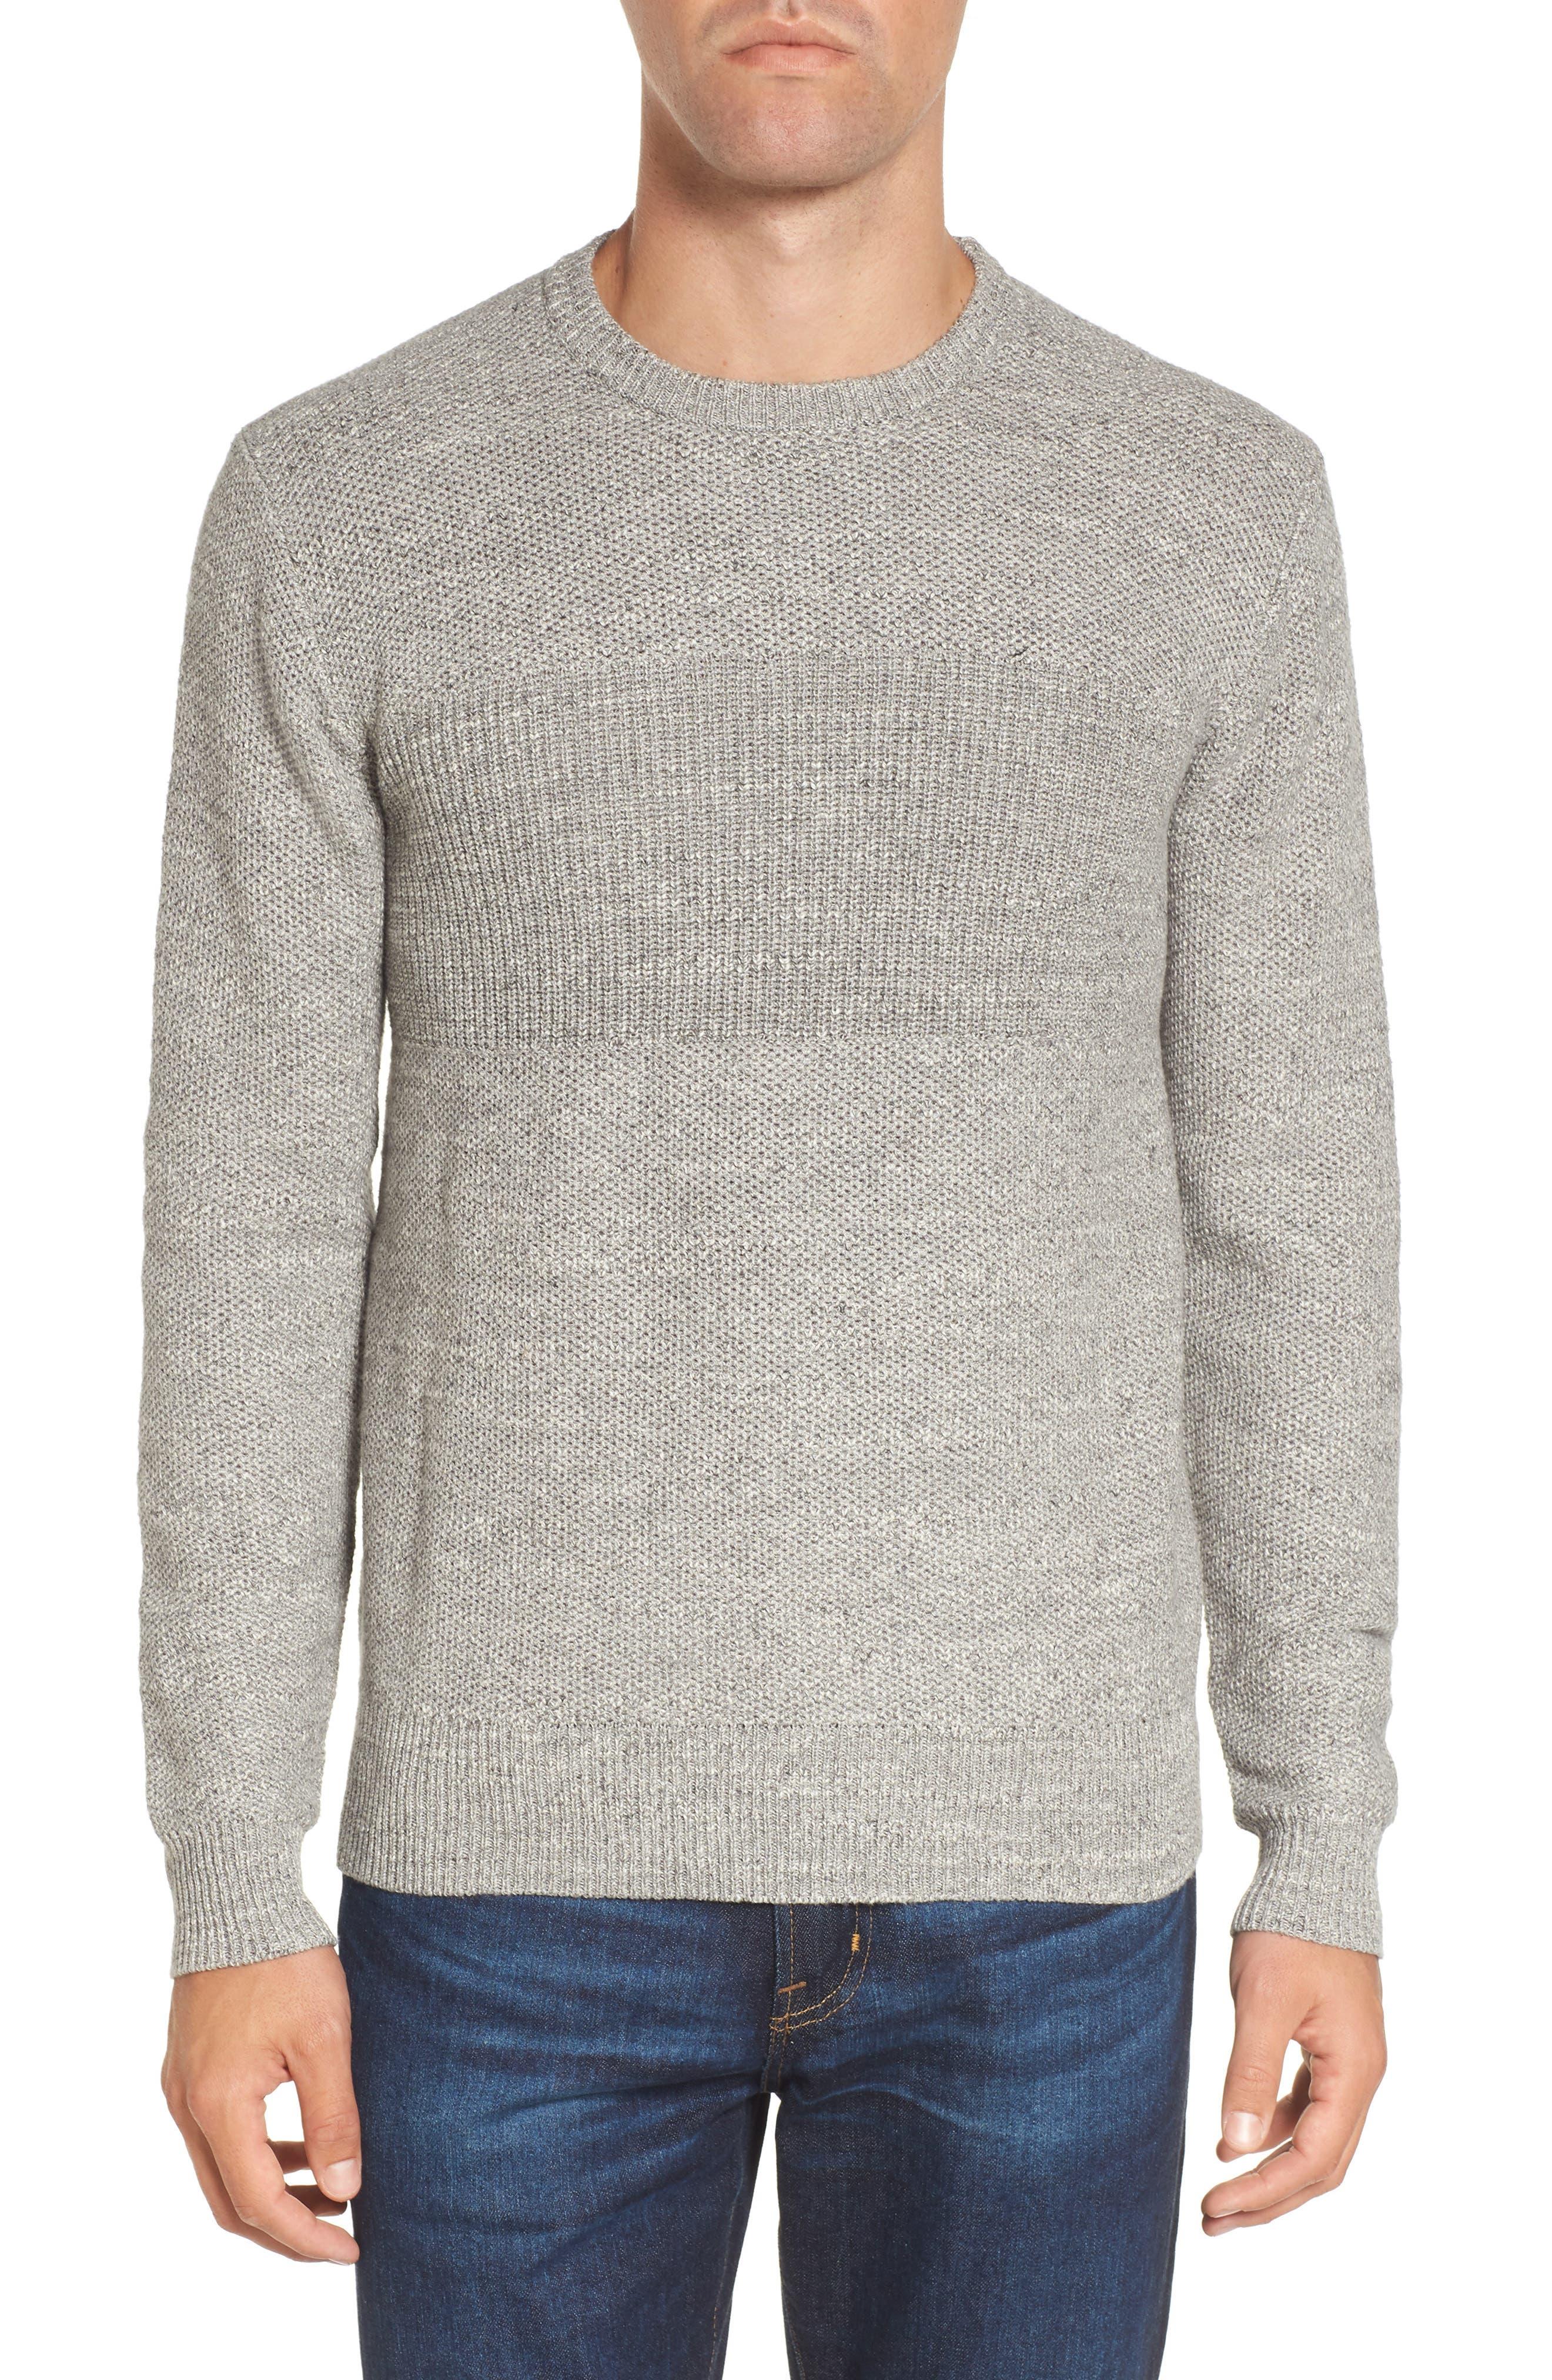 Grayers Ardsley Textured Sweater